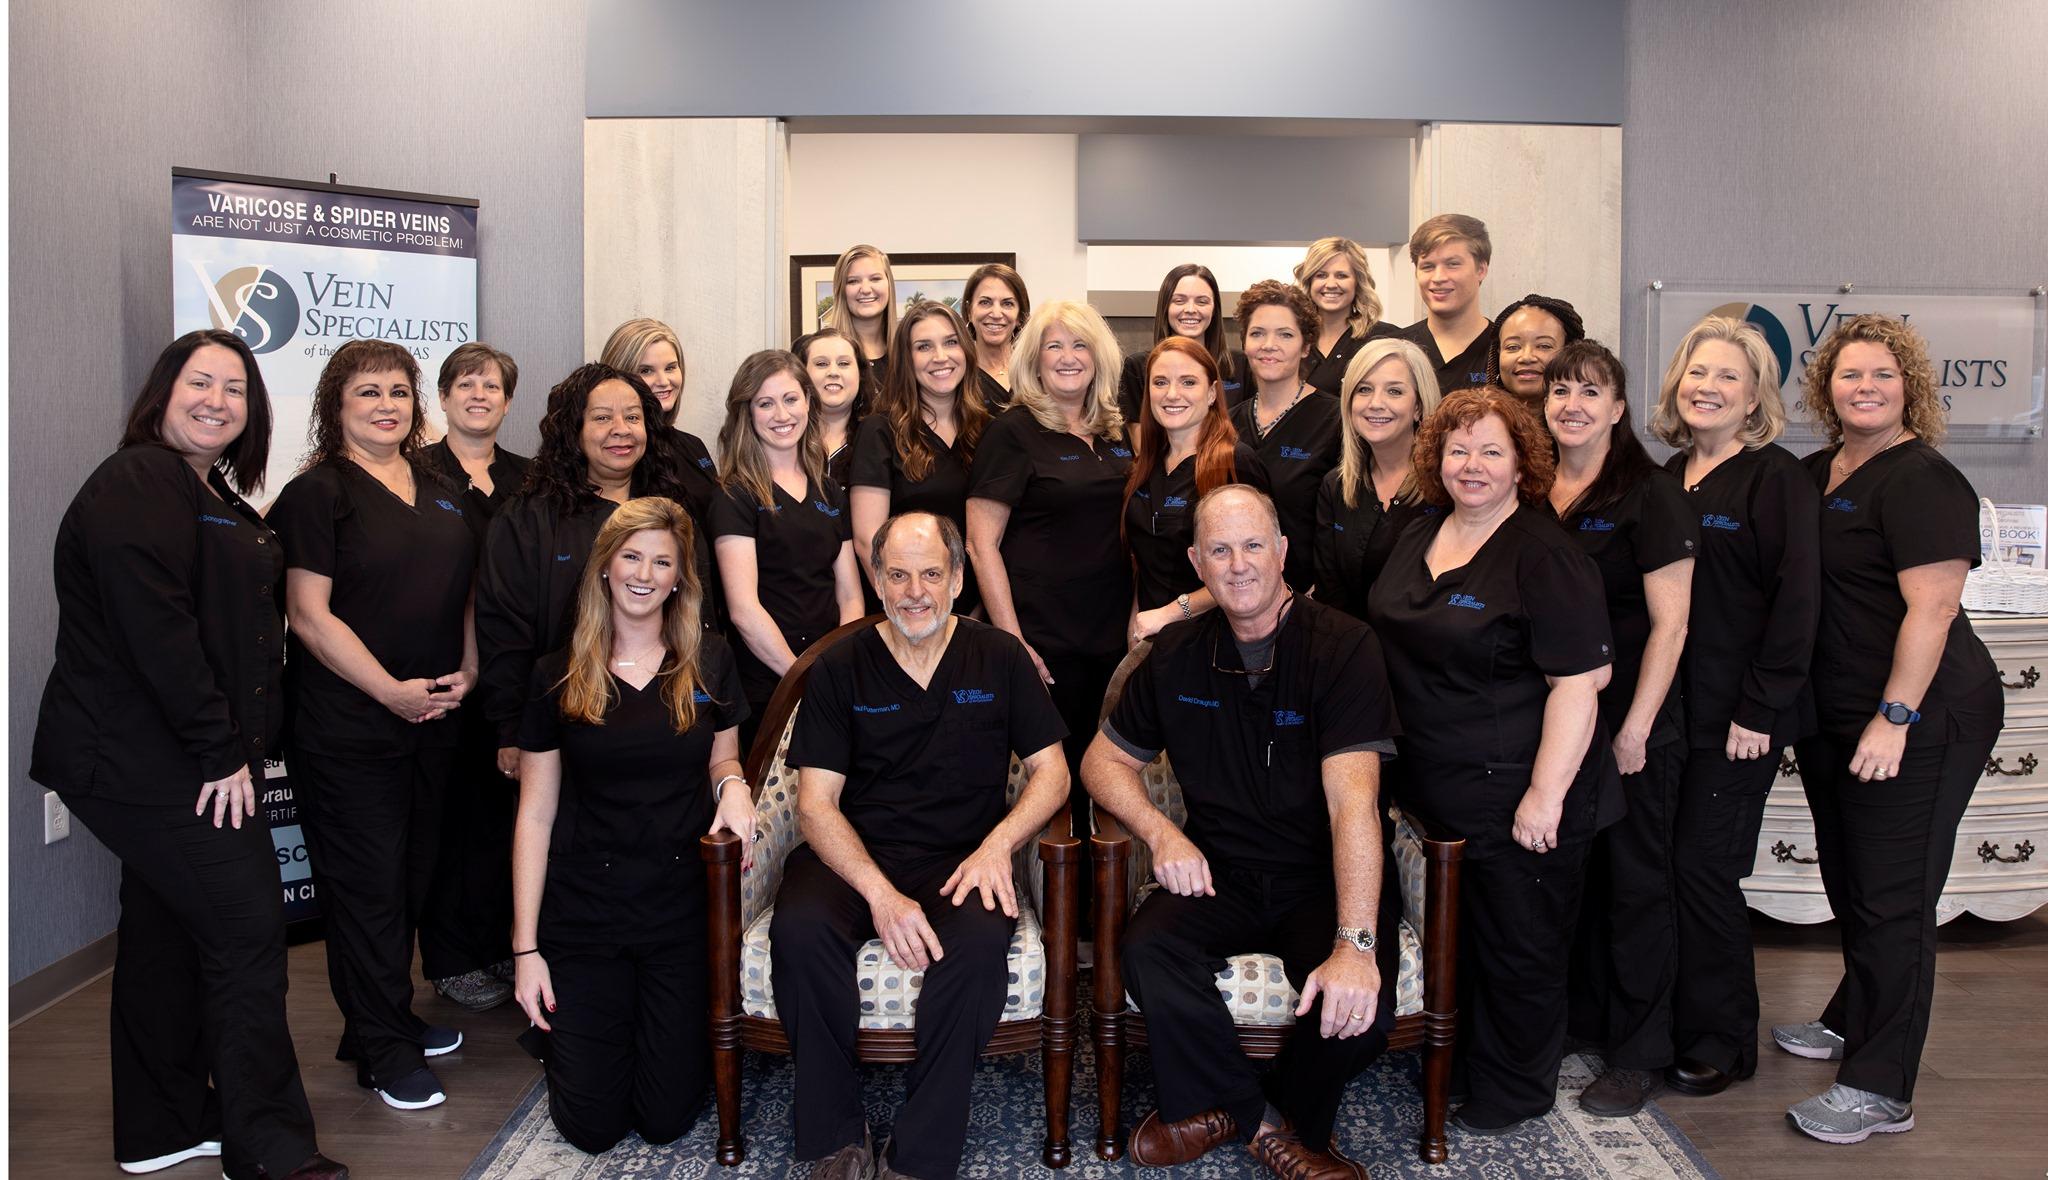 Patient Center, Vein Specialists of the Carolinas